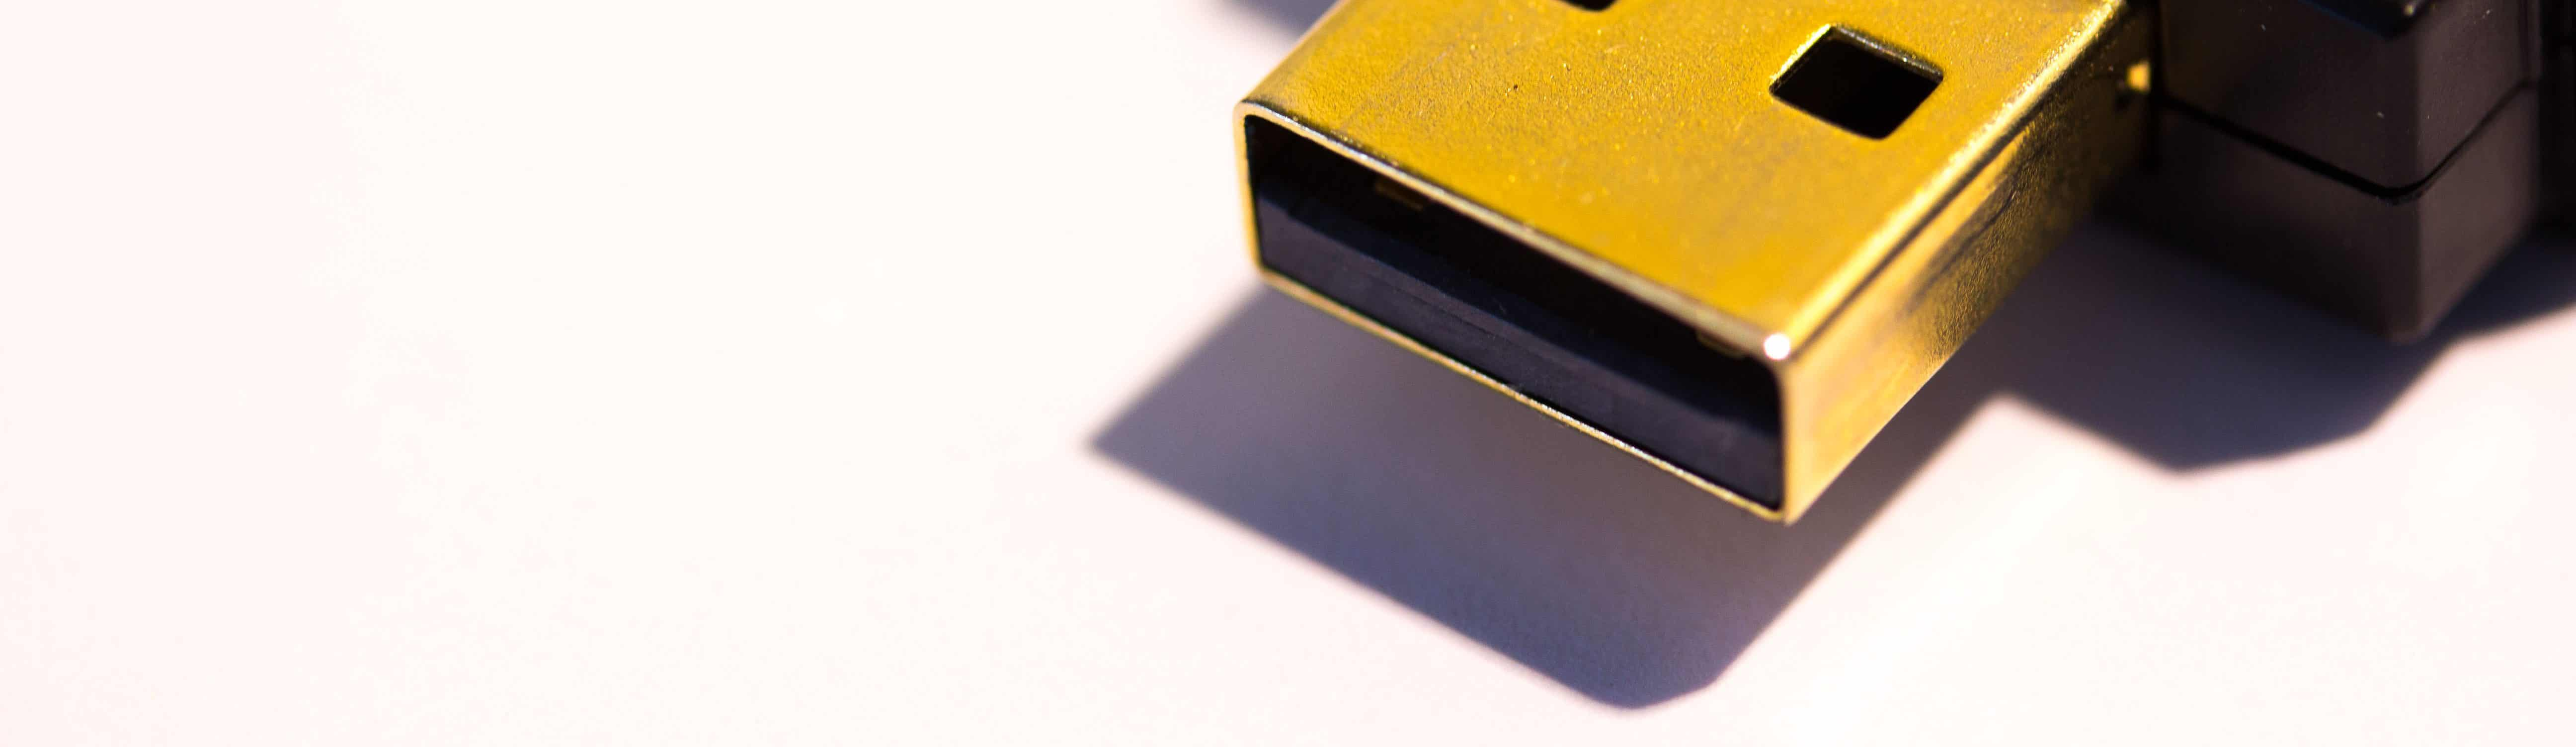 USB Stick Nahaufnahme.